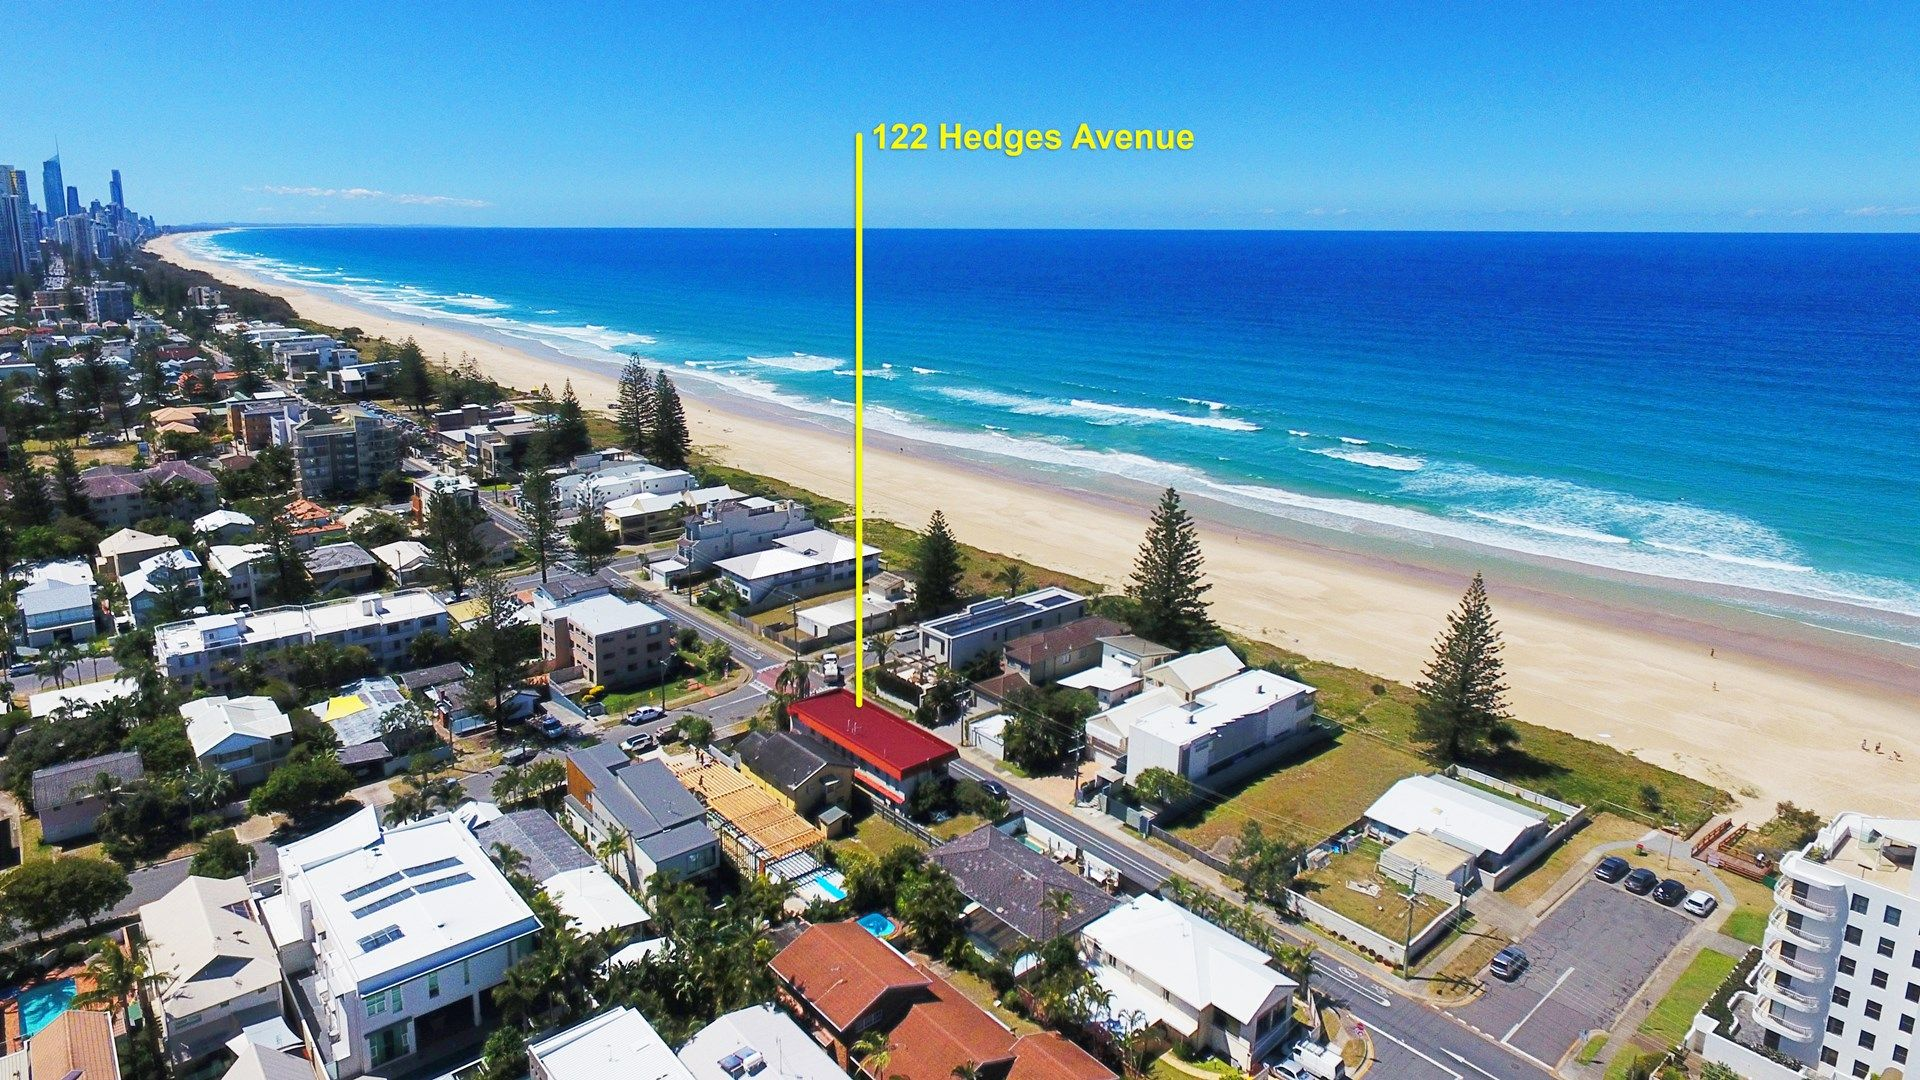 122 Hedges Avenue, Mermaid Beach QLD 4218, Image 0